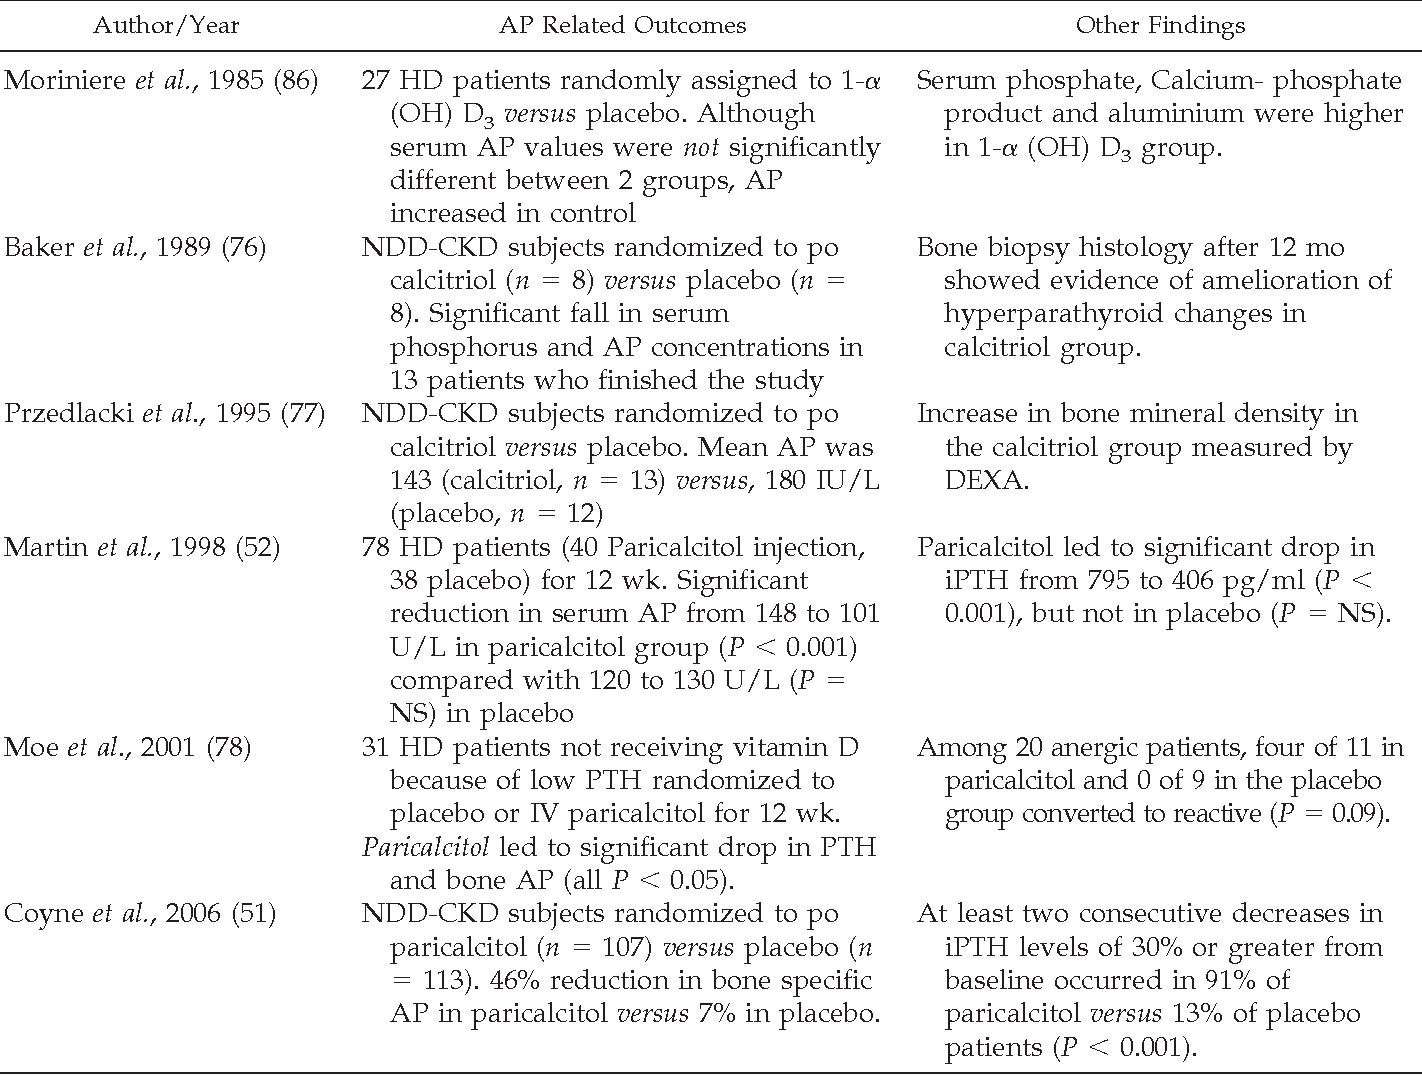 Table 4. Effect of active vitamin D agents on serum alkaline phosphatase (AP)